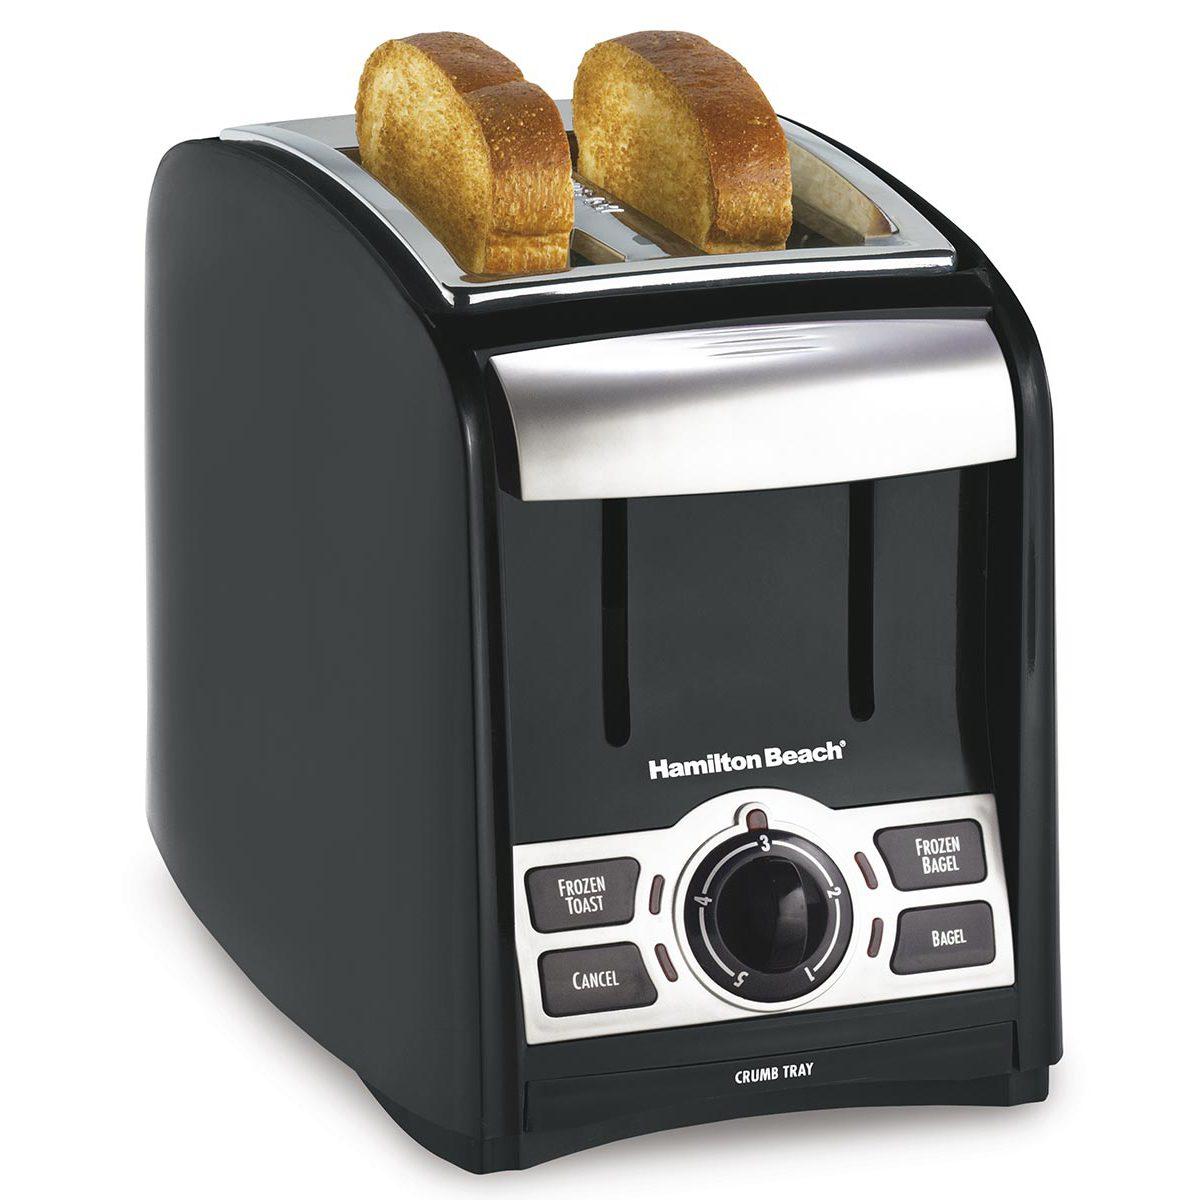 PerfectToast 2 Slice Toaster - Black & Silver (22124)